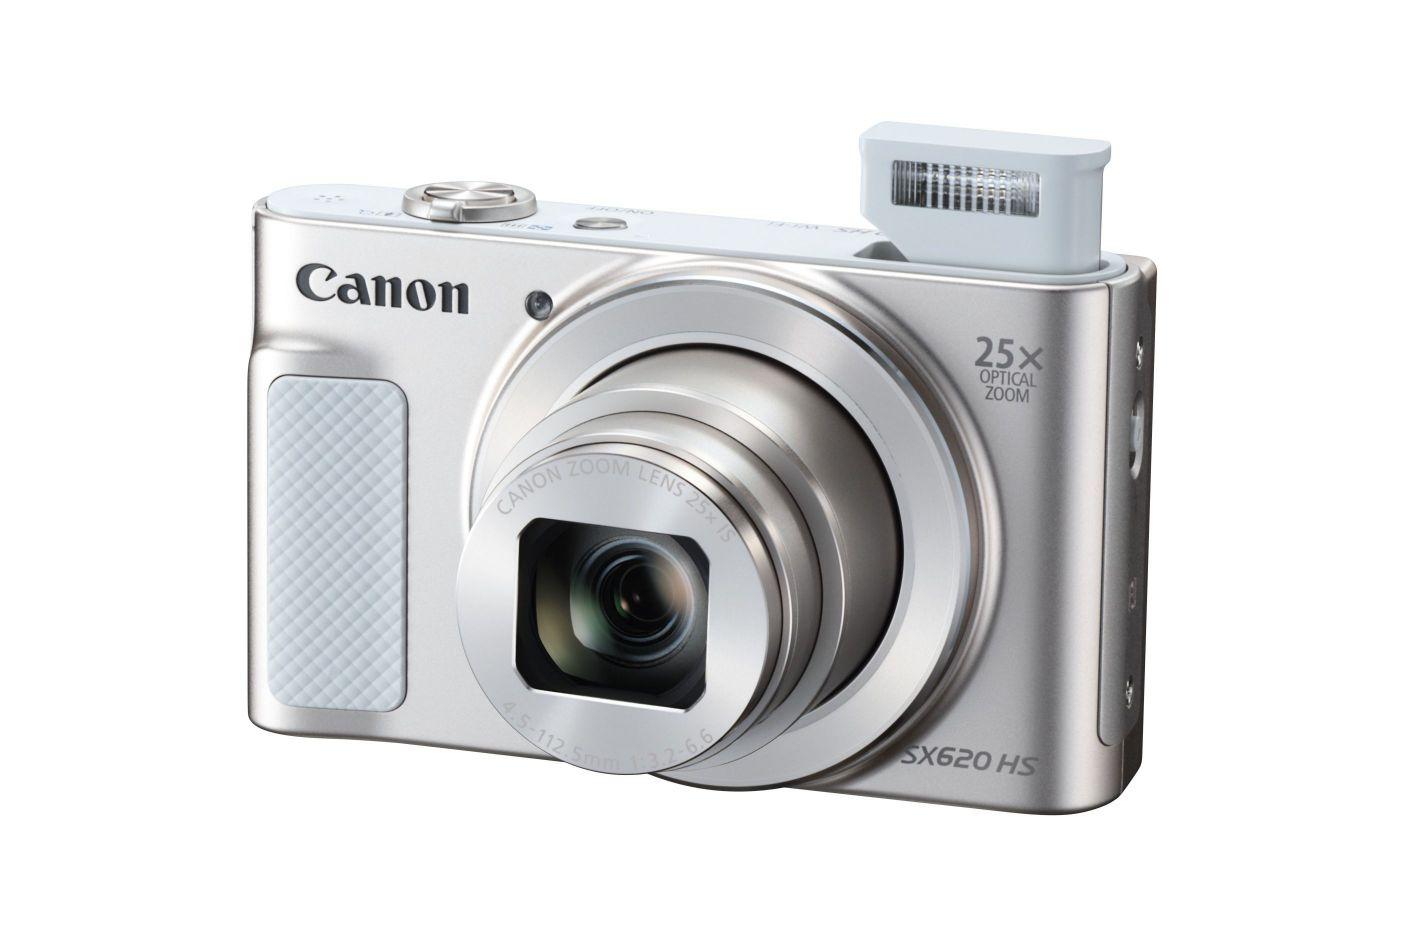 Canon PowerShot SX620 HS Camara compacta 20 2 MP 1